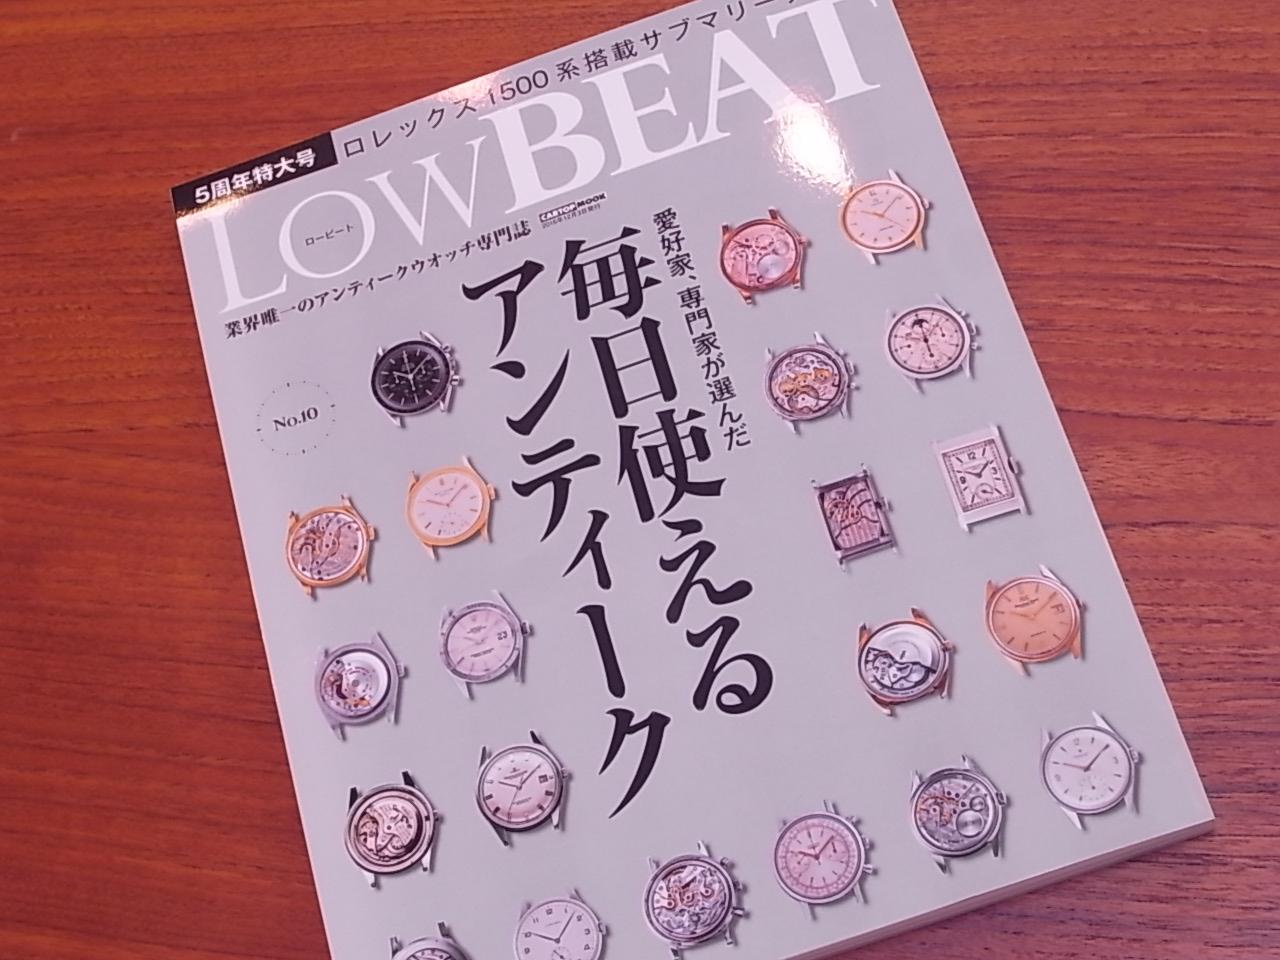 LowBEAT(ロービート)No.10 発売 第2回ミリタリー特集